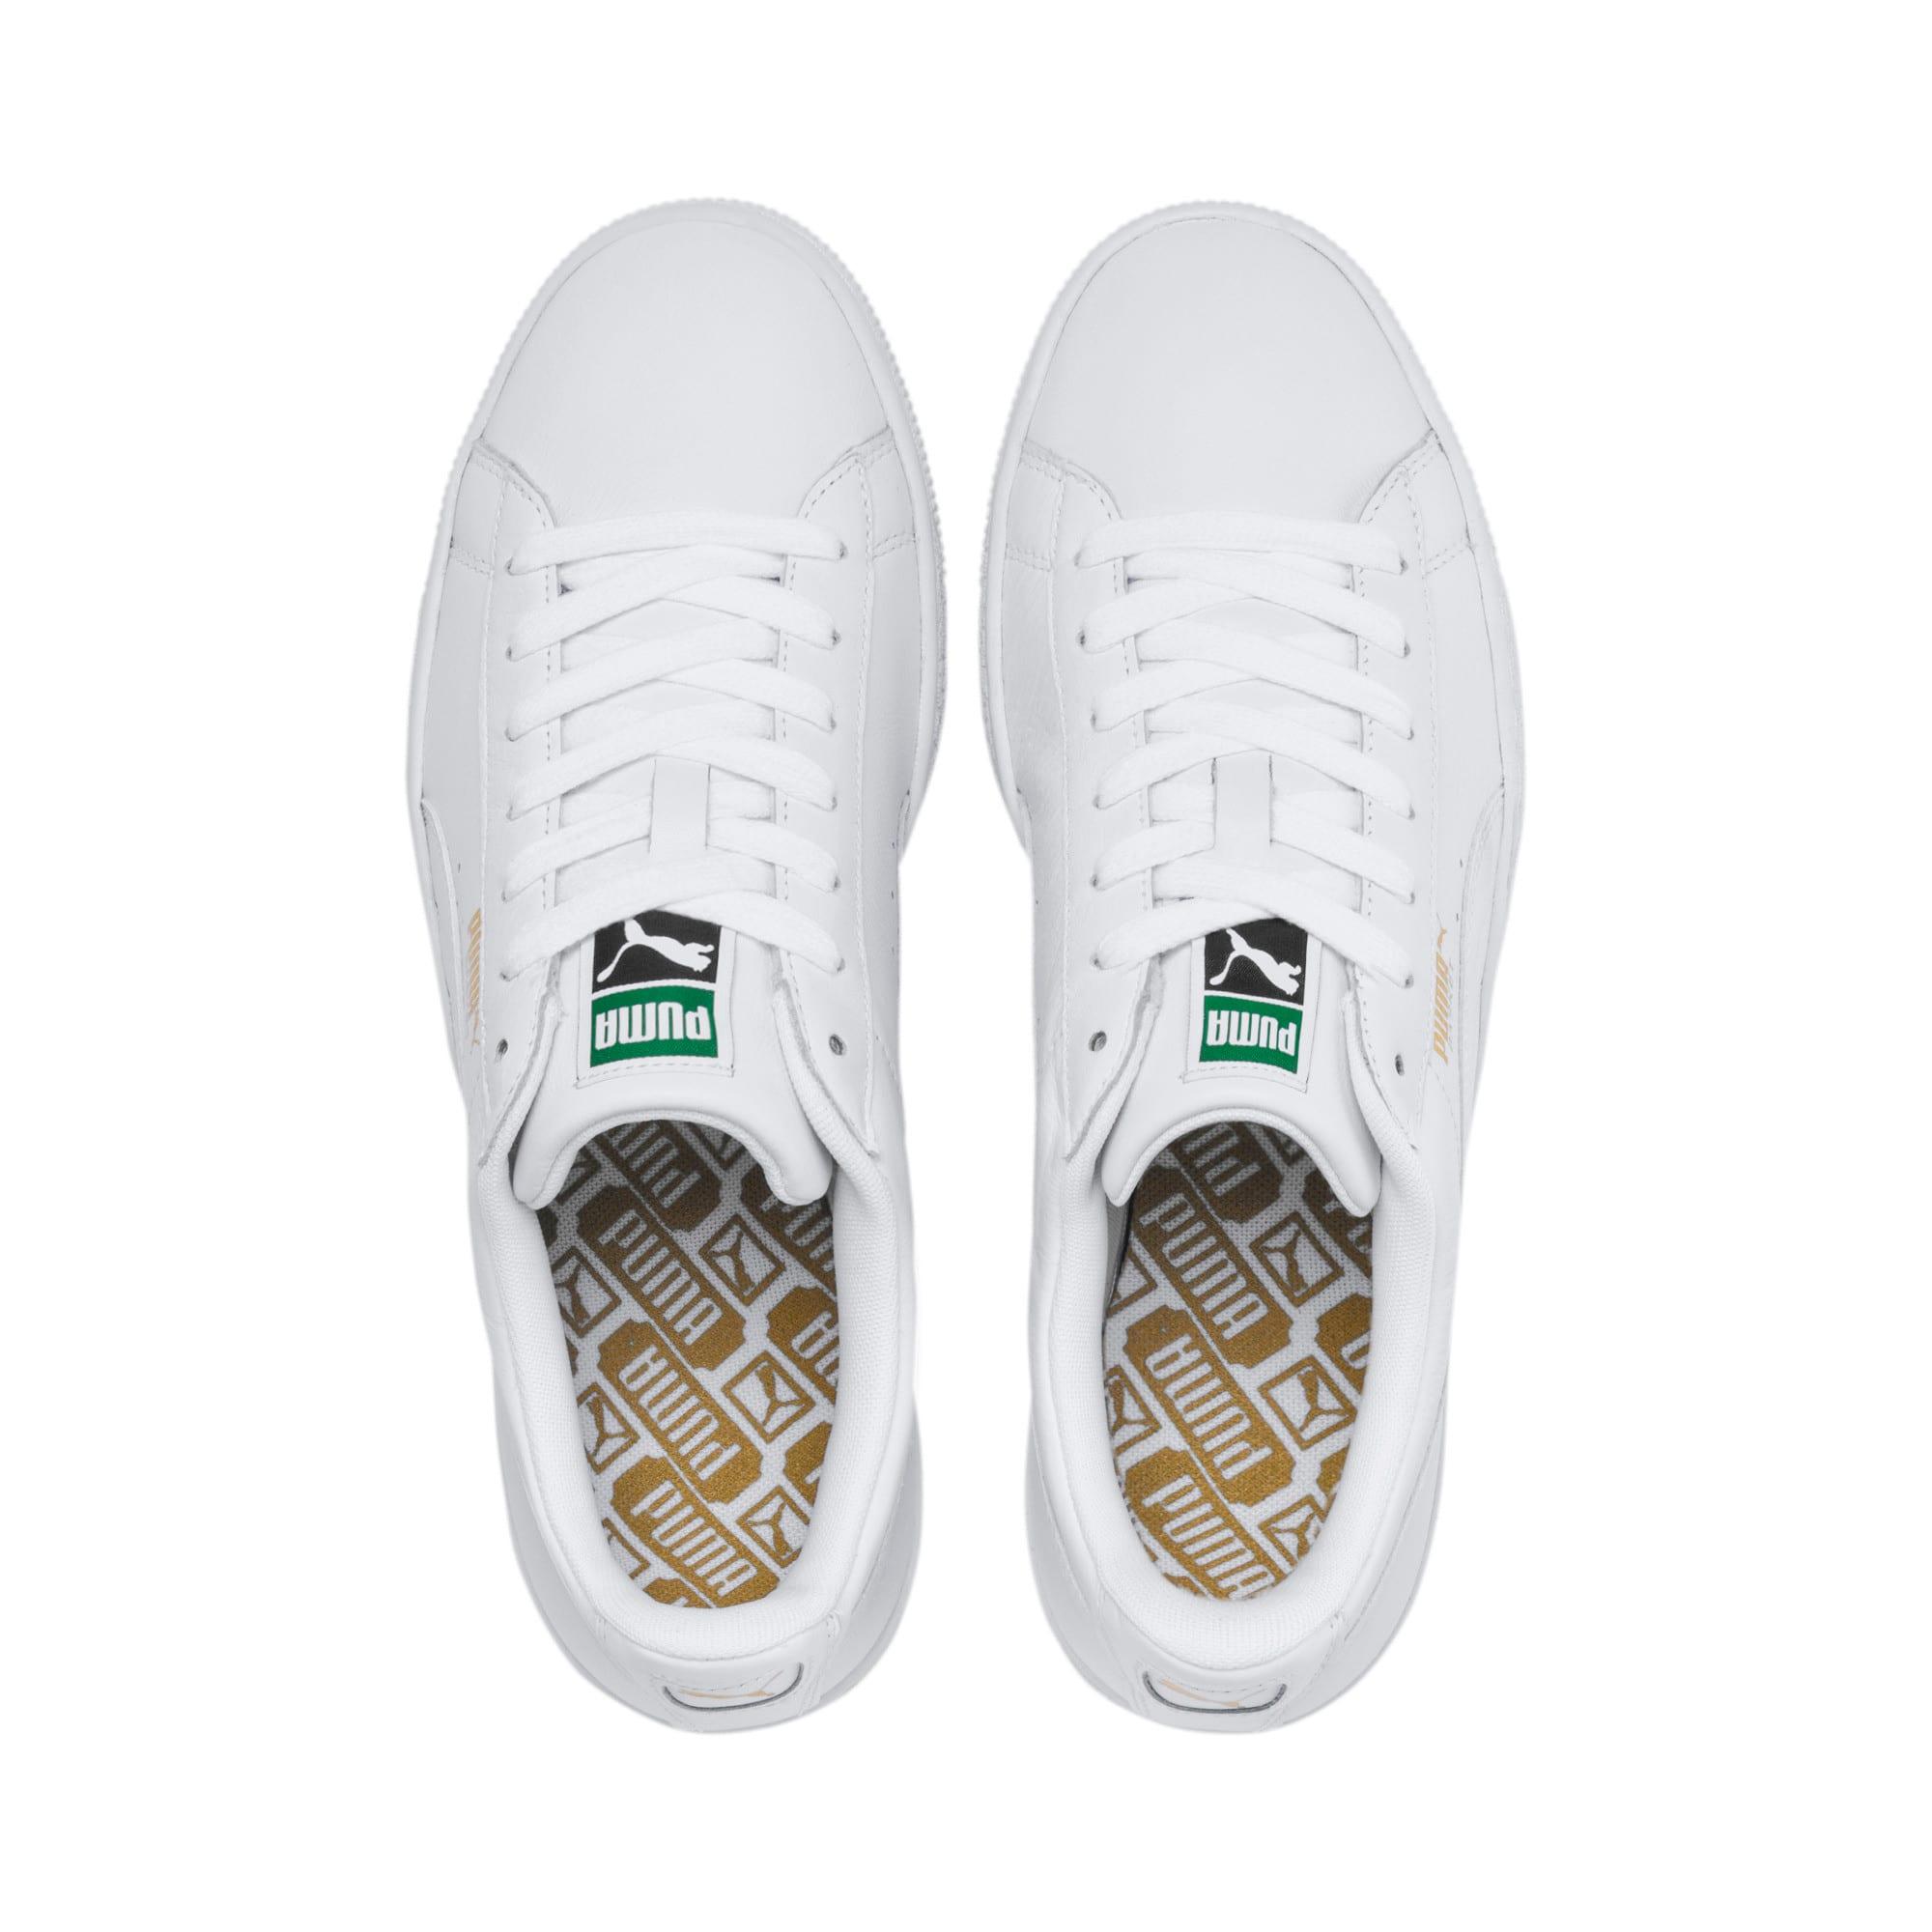 Thumbnail 6 of Basket Classic LFS schoenen voor heren, white-white, medium